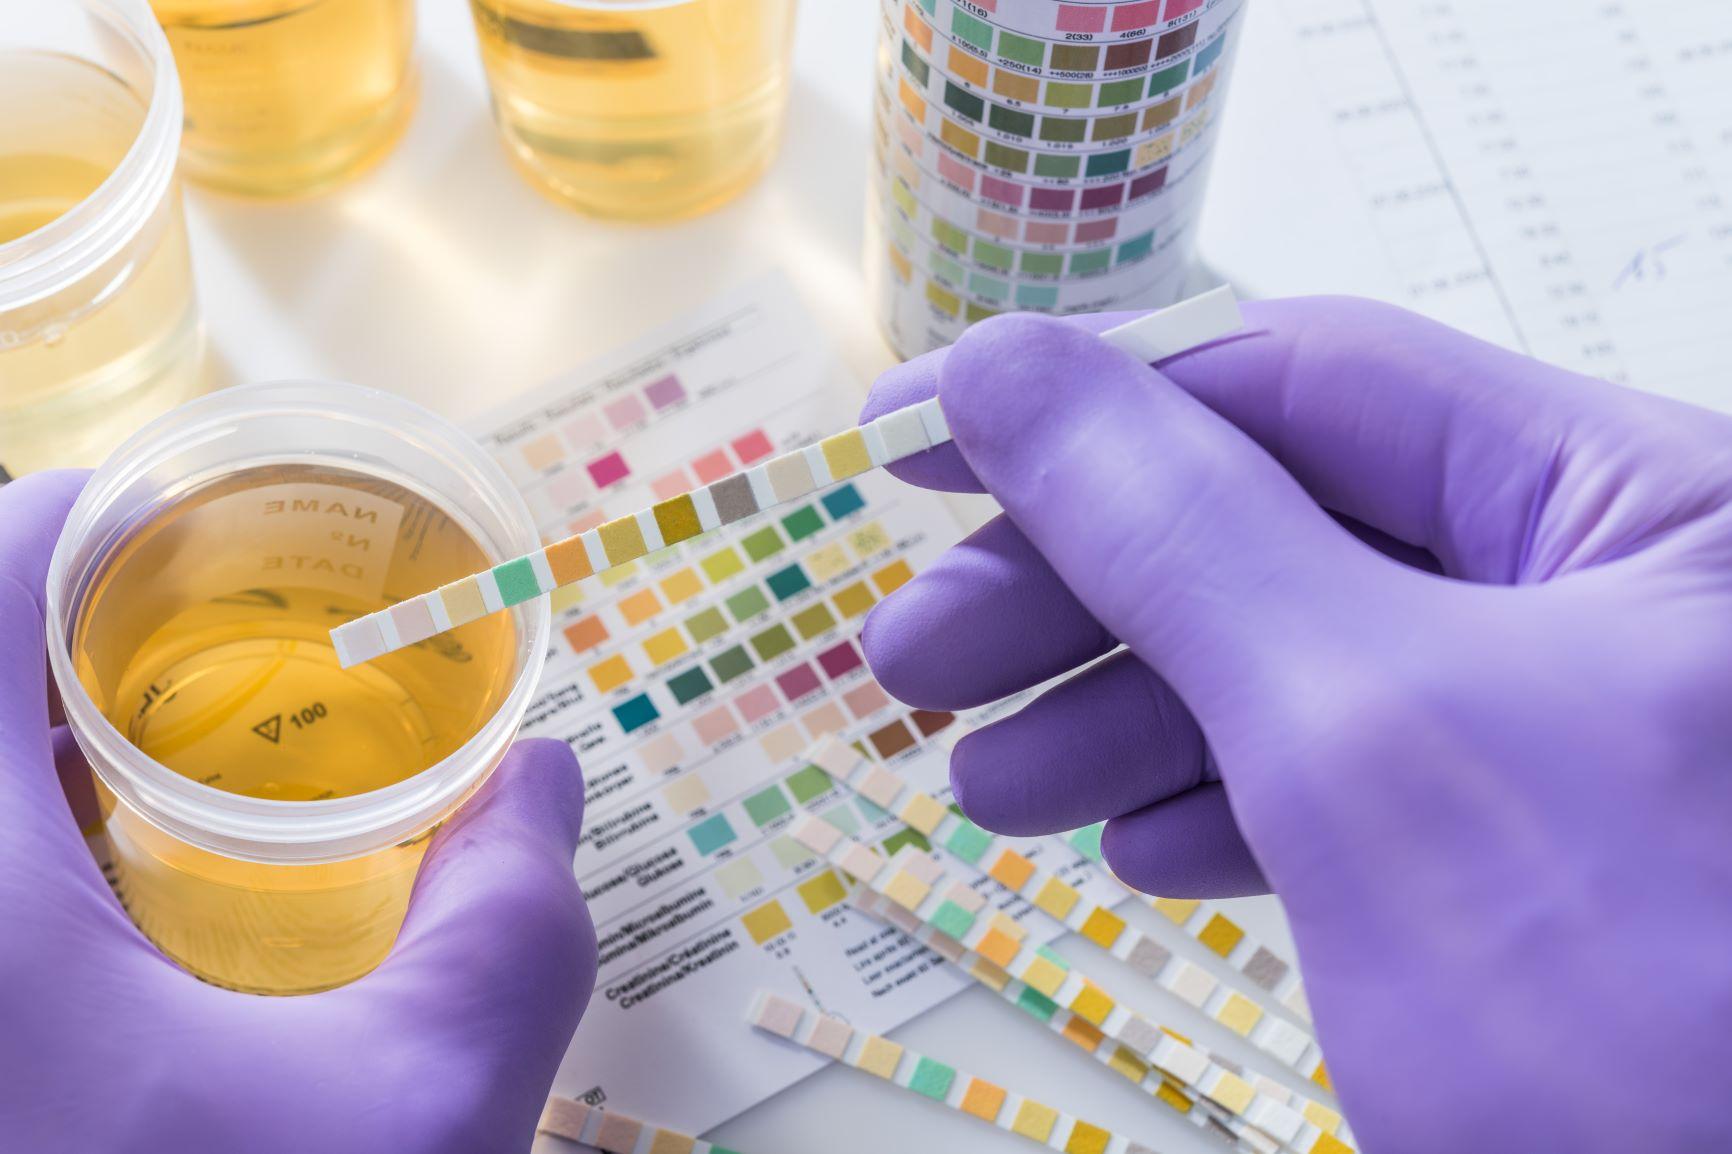 Discolored urine causes